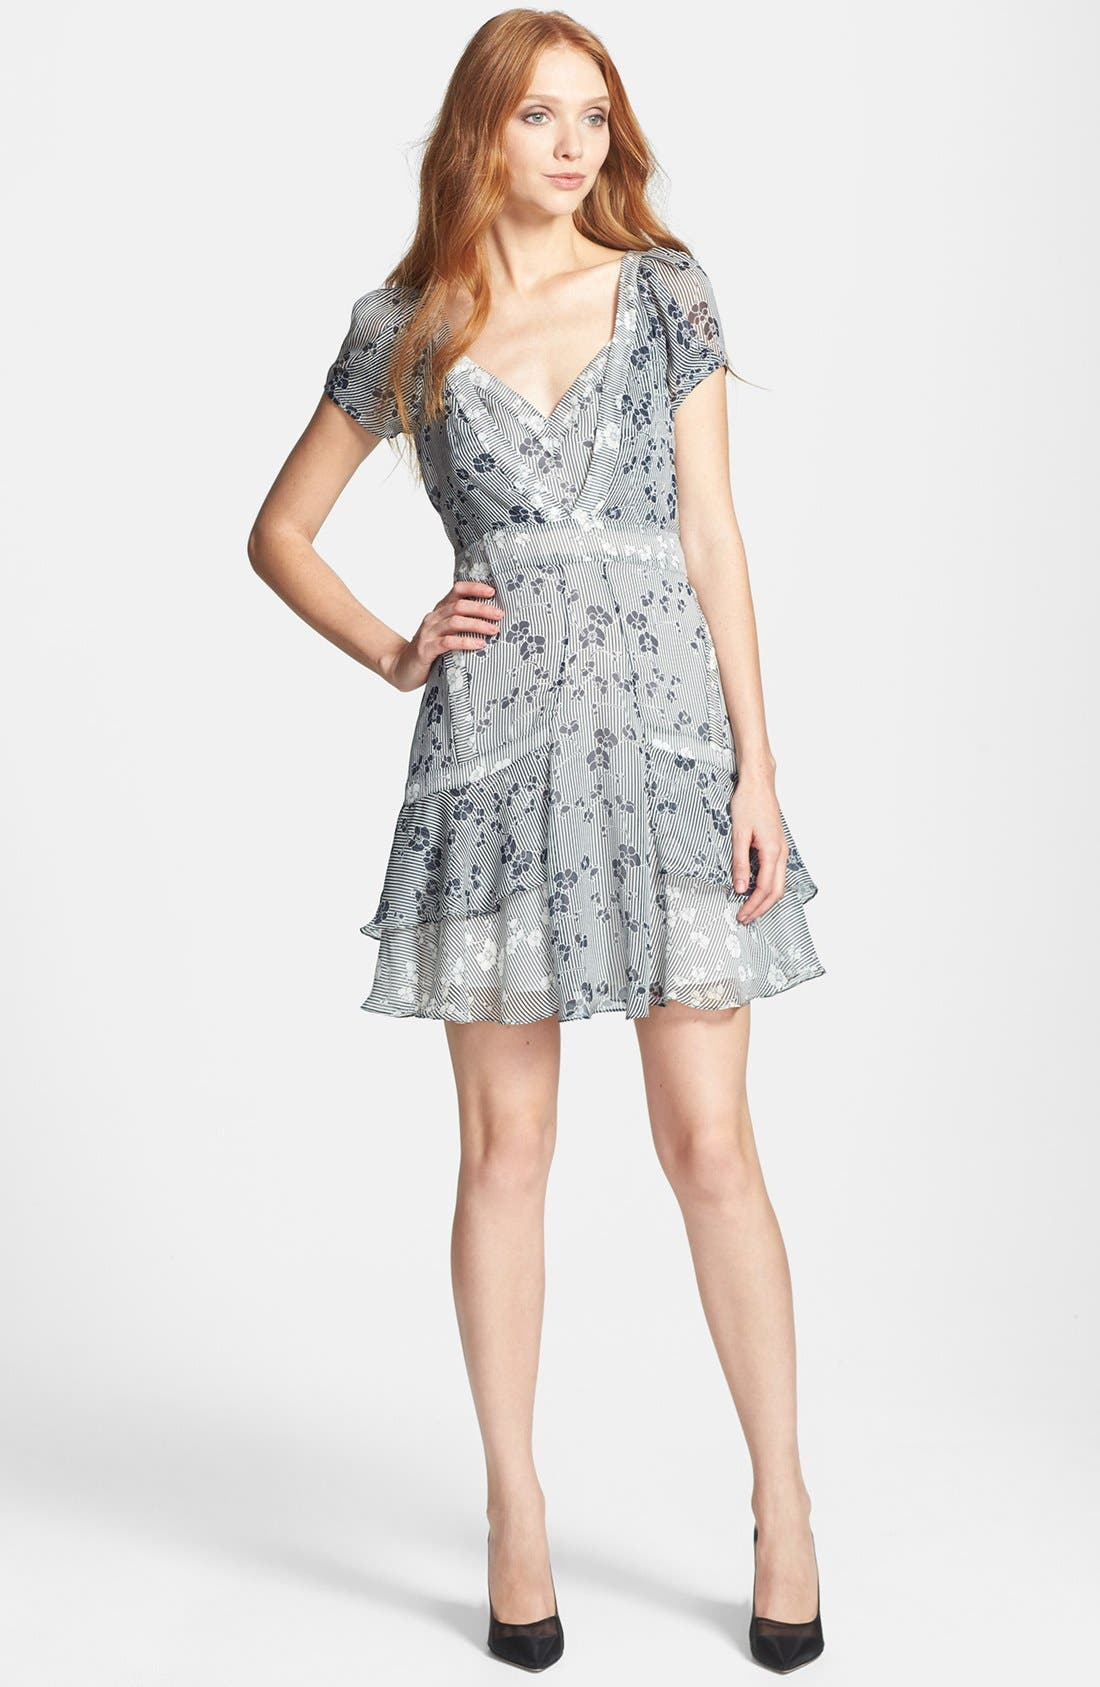 Alternate Image 1 Selected - Diane von Furstenberg 'Heidi' Print Silk A-Line Dress